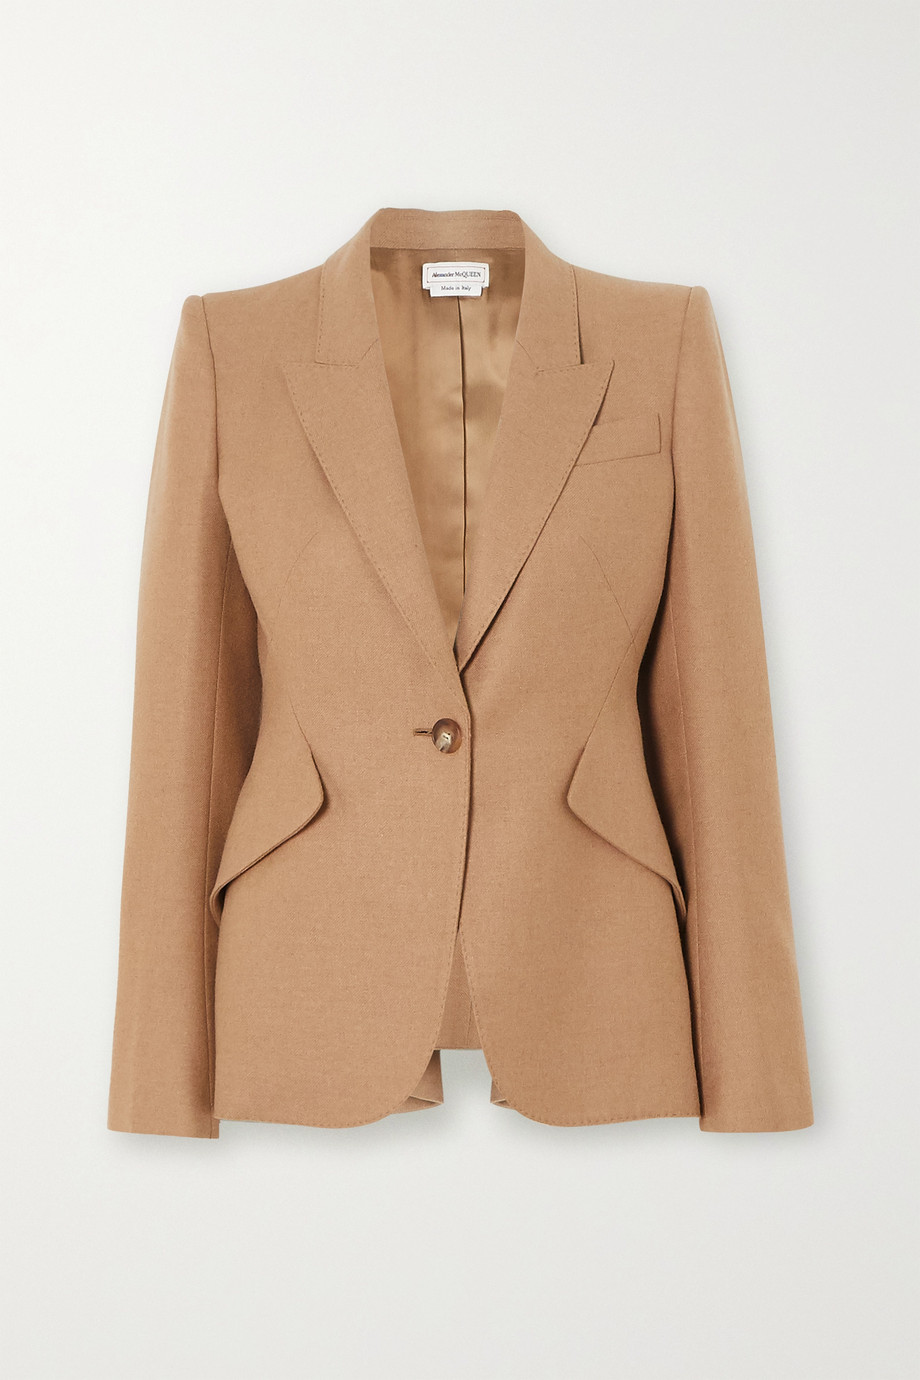 Alexander McQueen Ruffled wool blazer